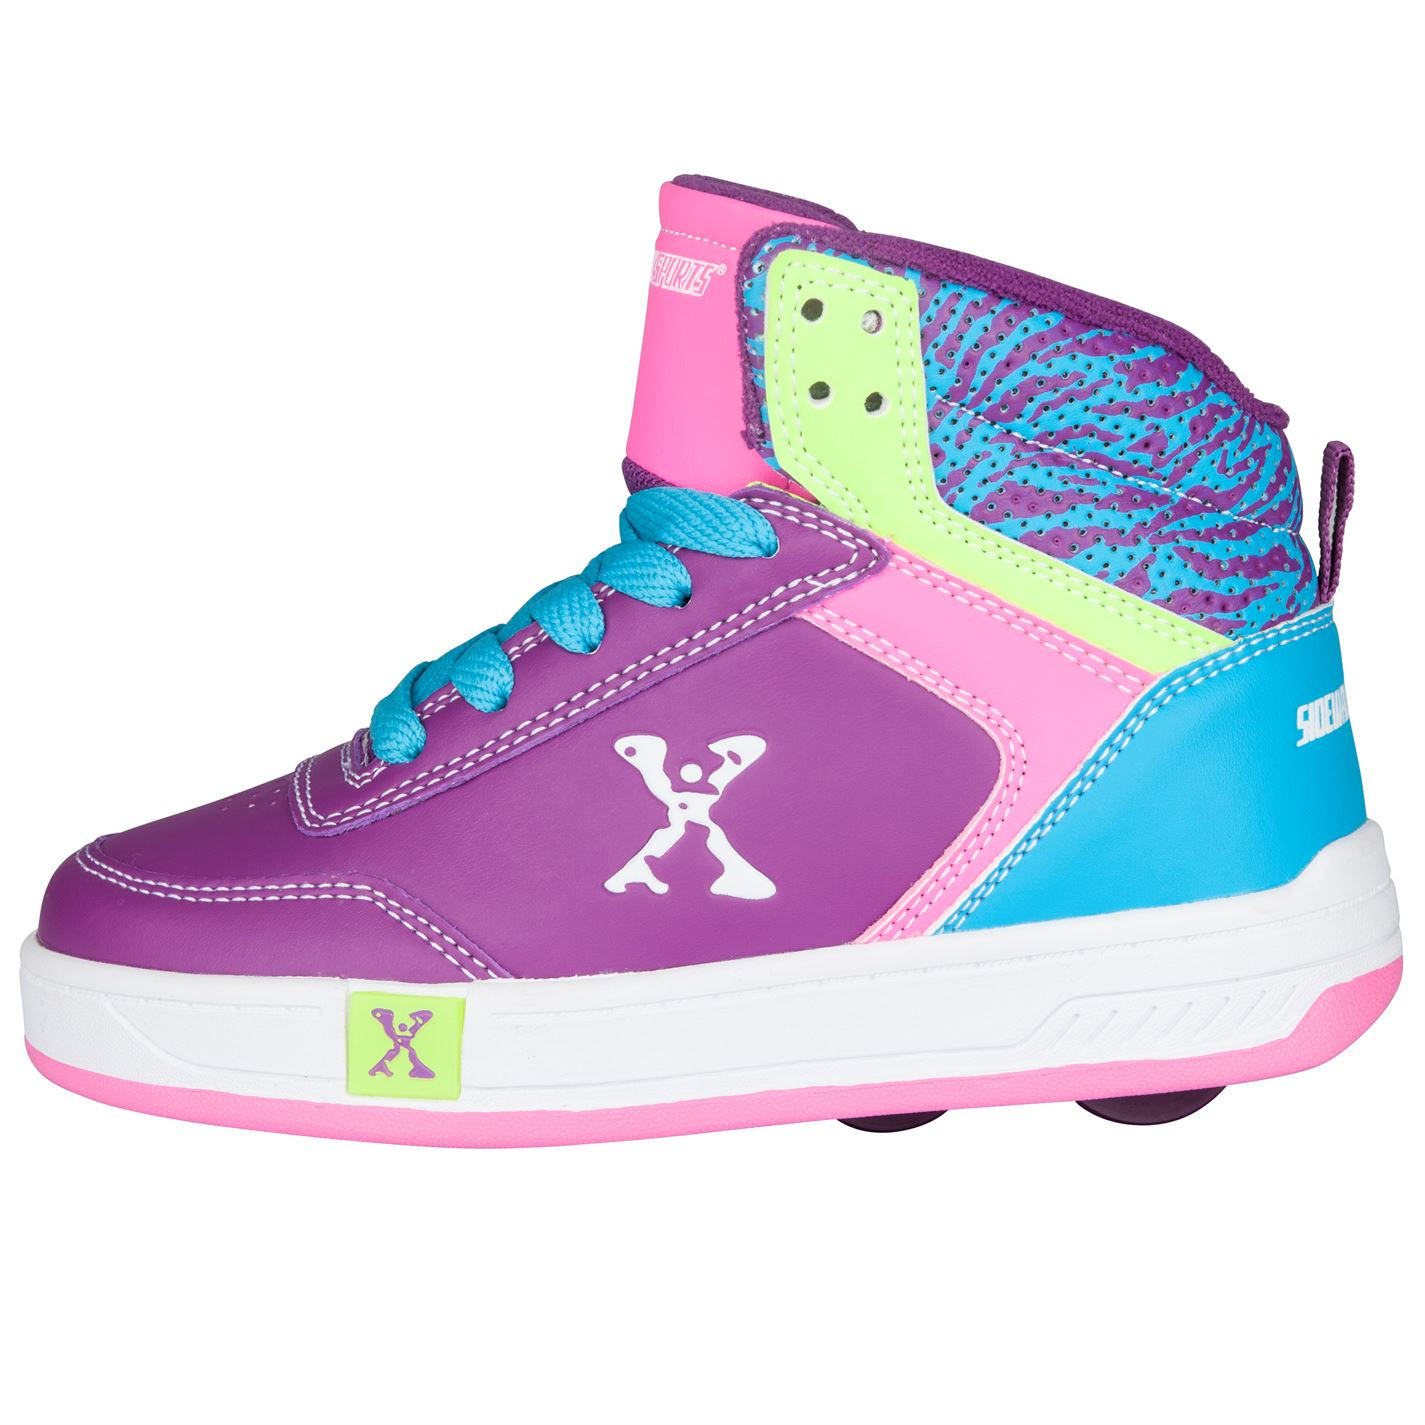 Sidewalk Sport Childrens Girl Hi Top Skate Laces Fastened Wheeled Shoes Footwear